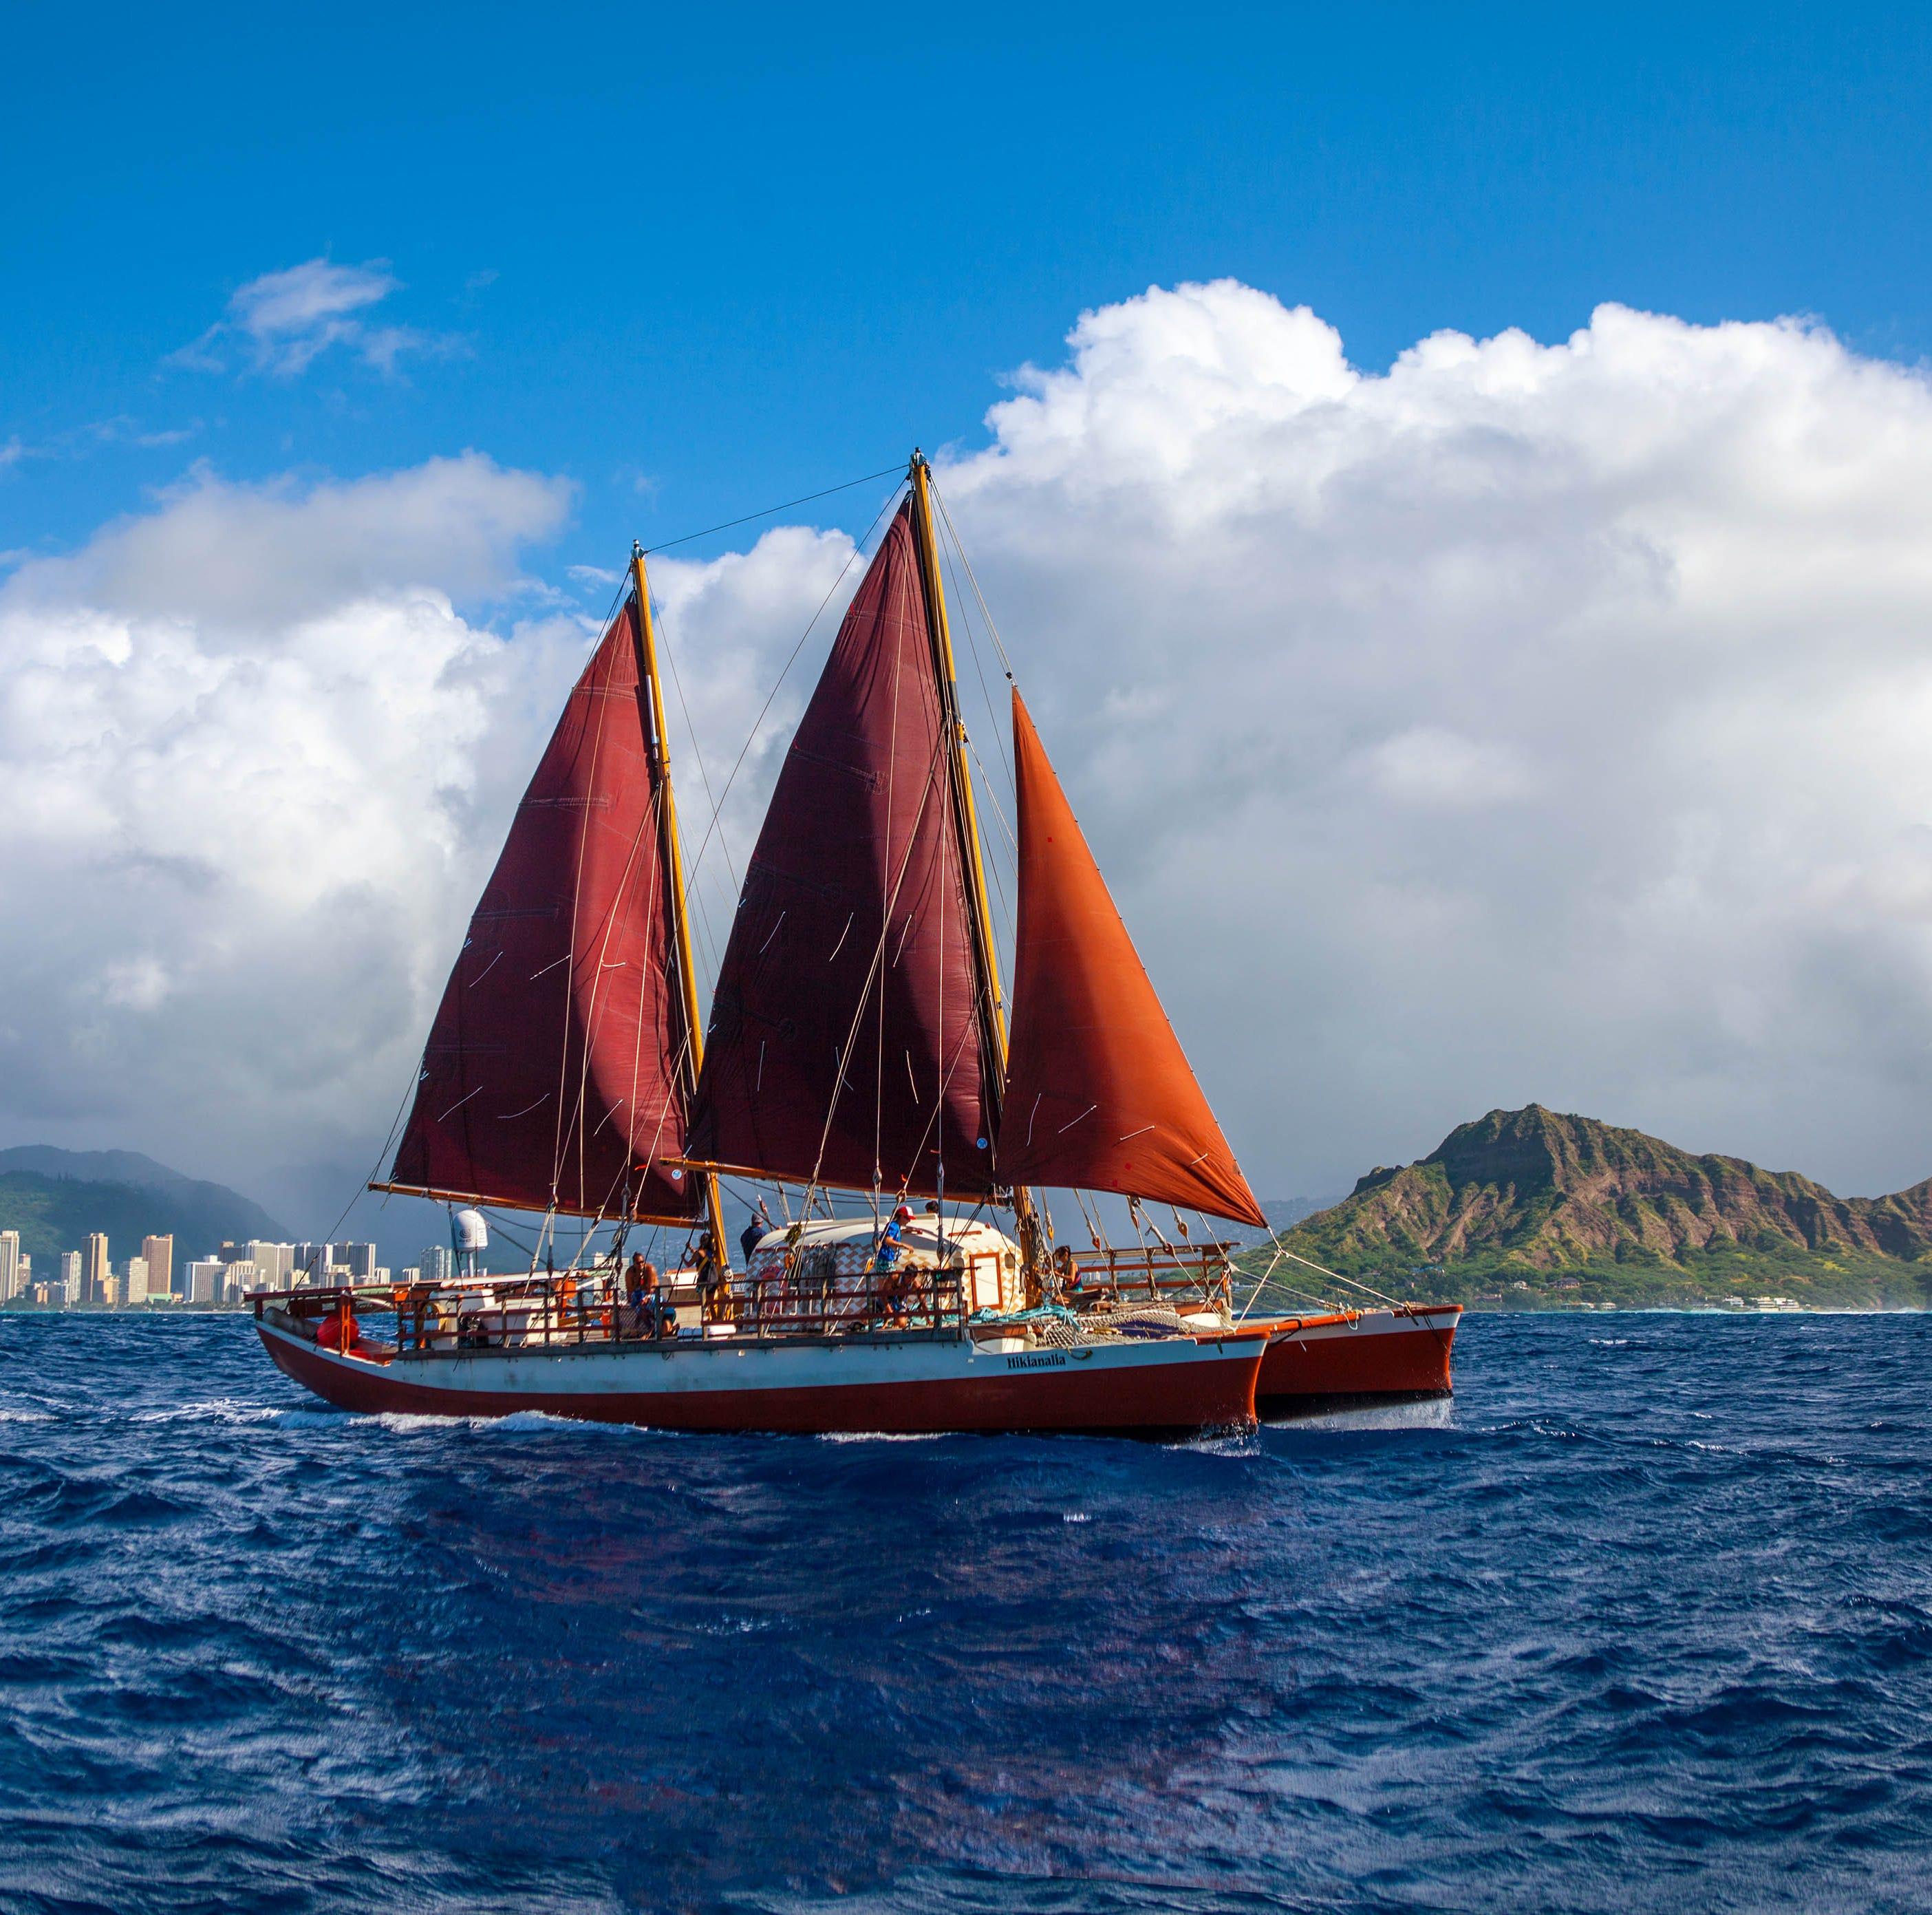 Why a Polynesian canoe sailed 2,800 miles to dock in Ventura